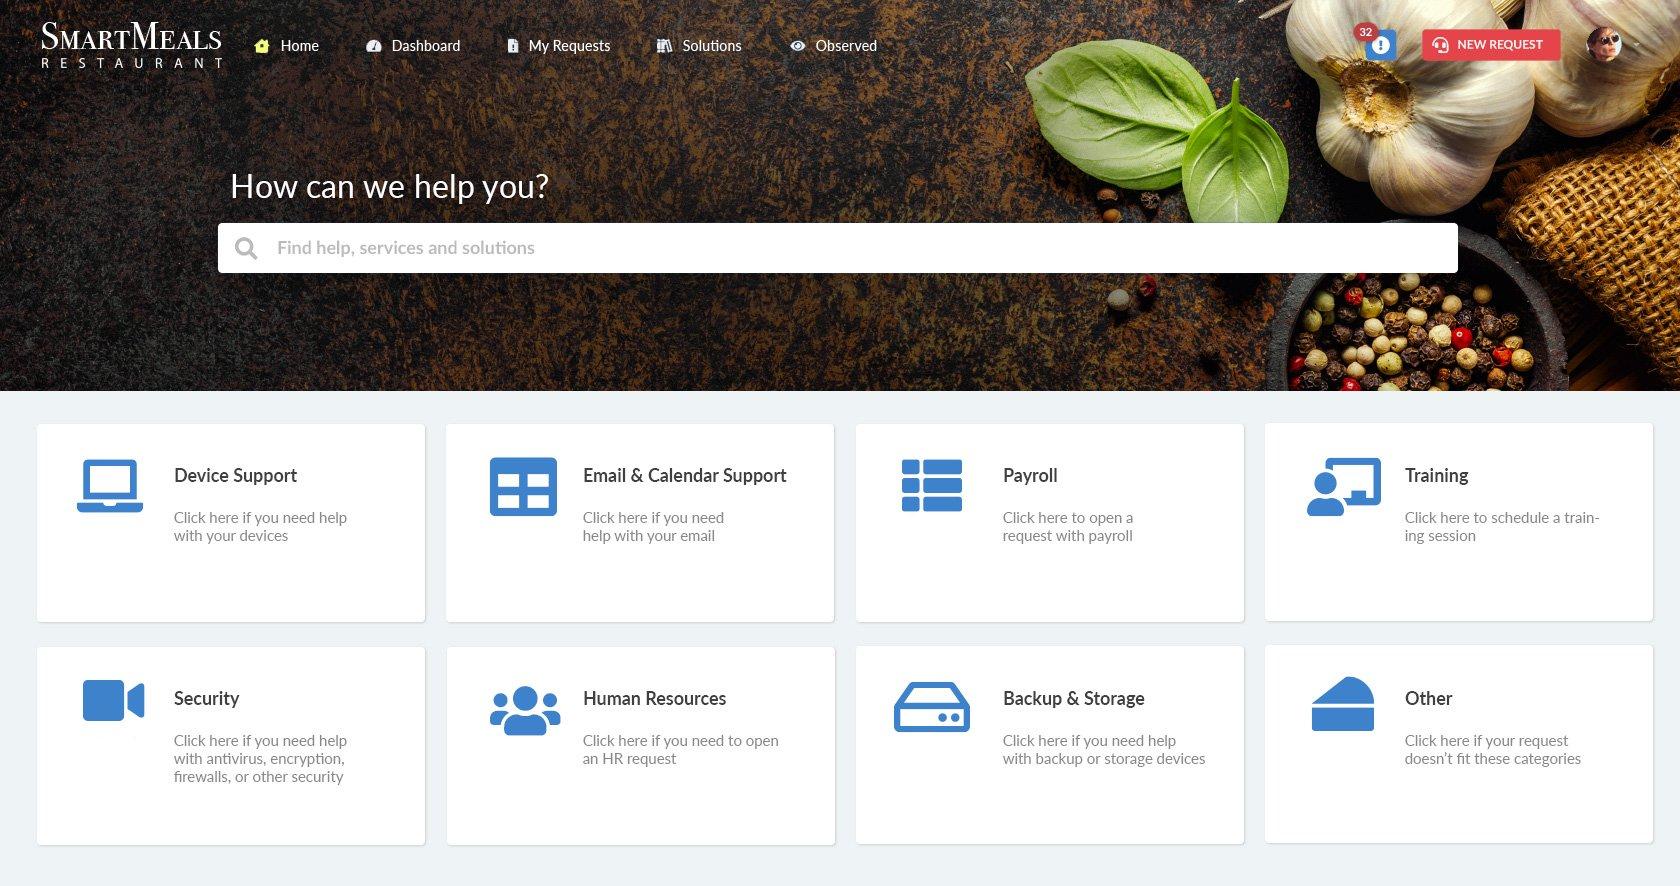 Self-service portal for a restaurant